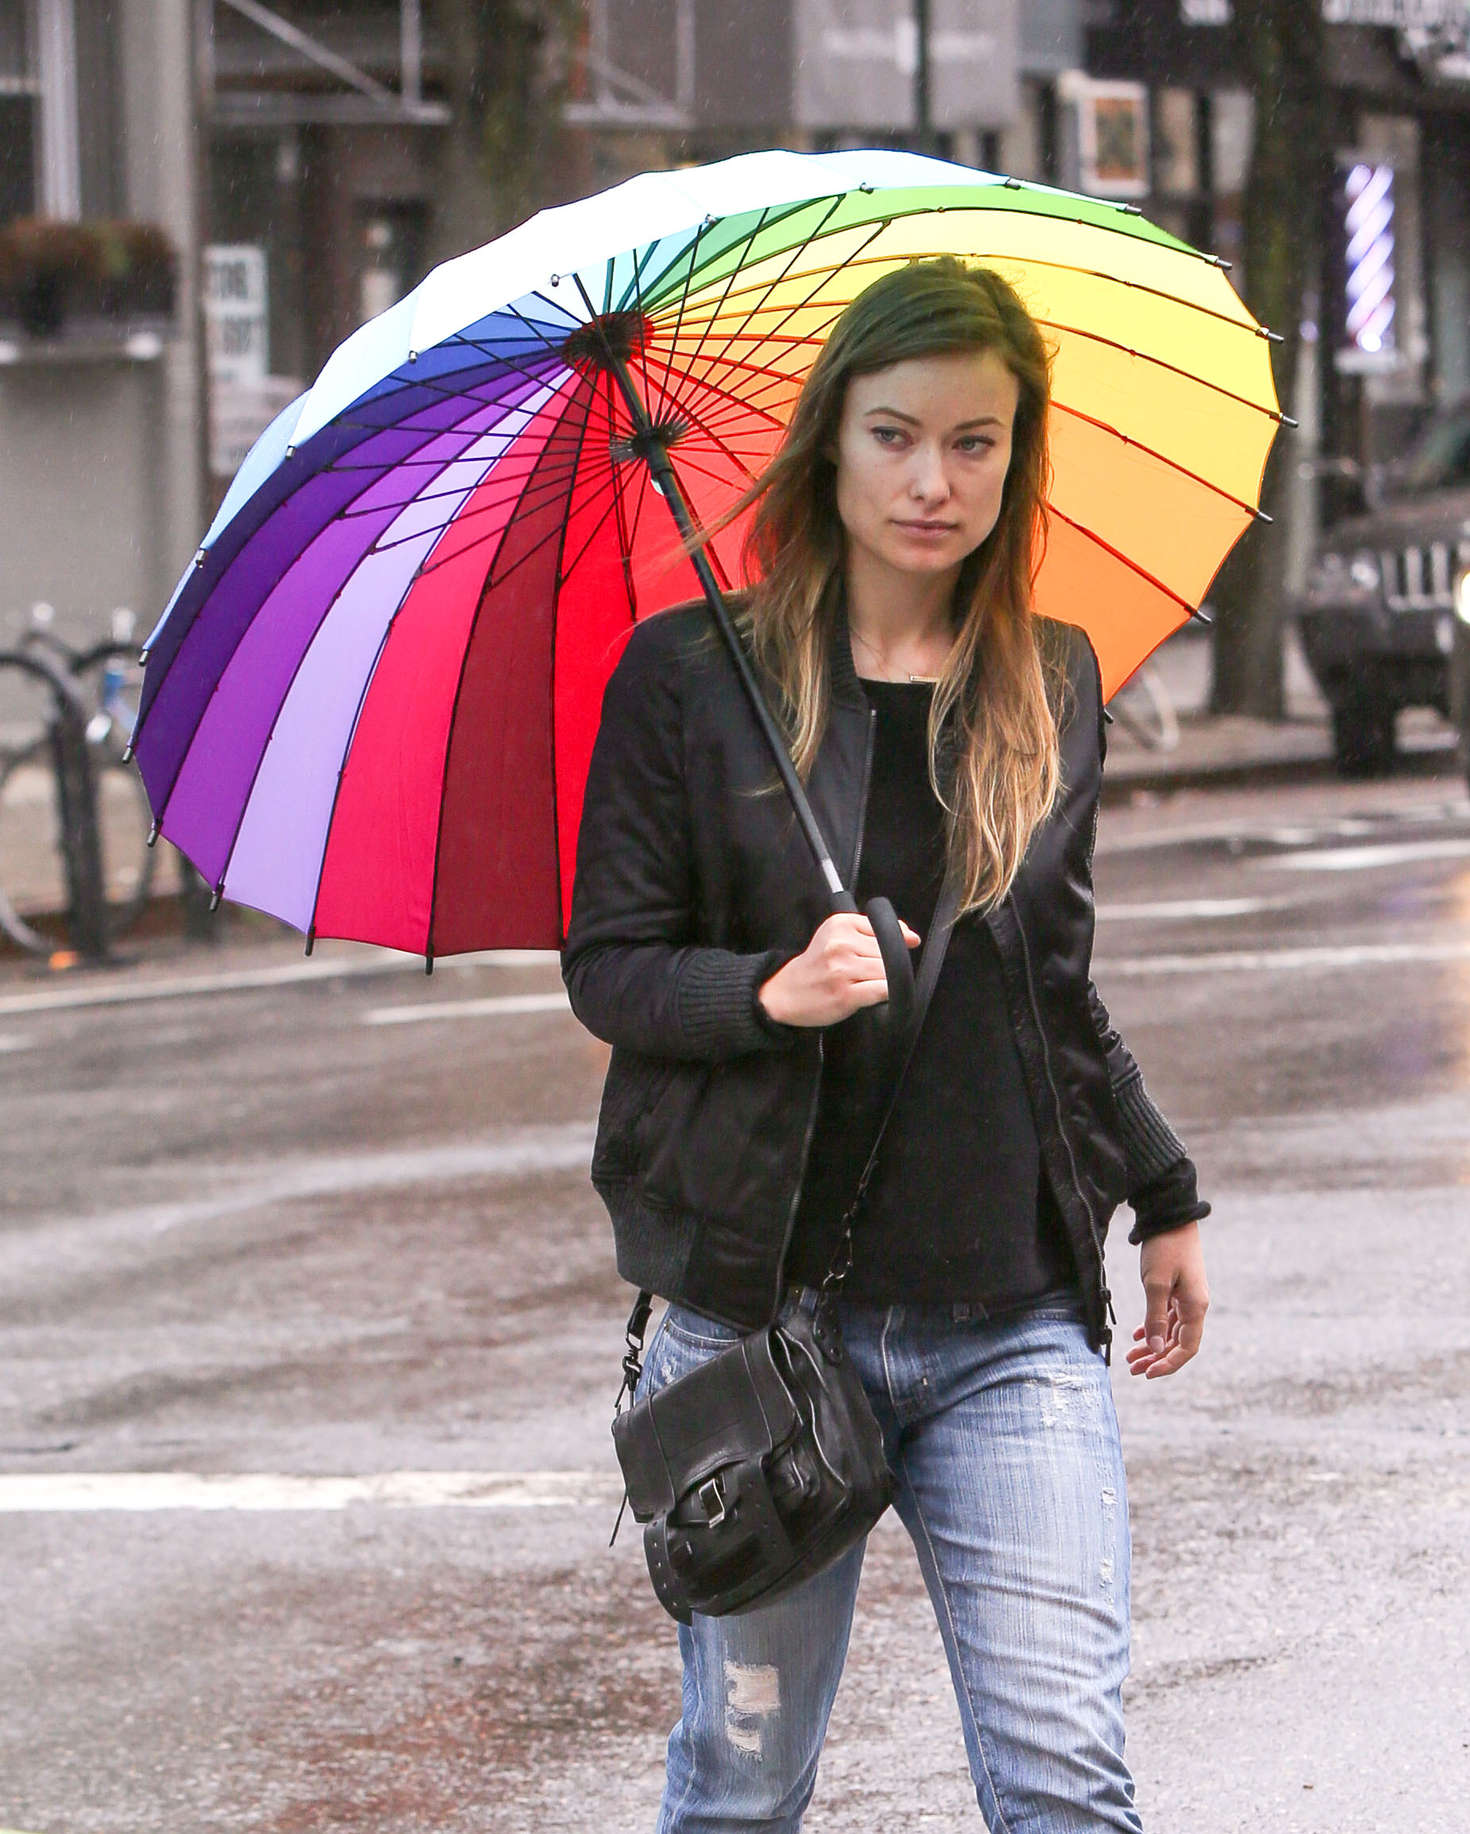 Good Morning America Umbrella : Olivia wilde with a rainbow umbrella in new york